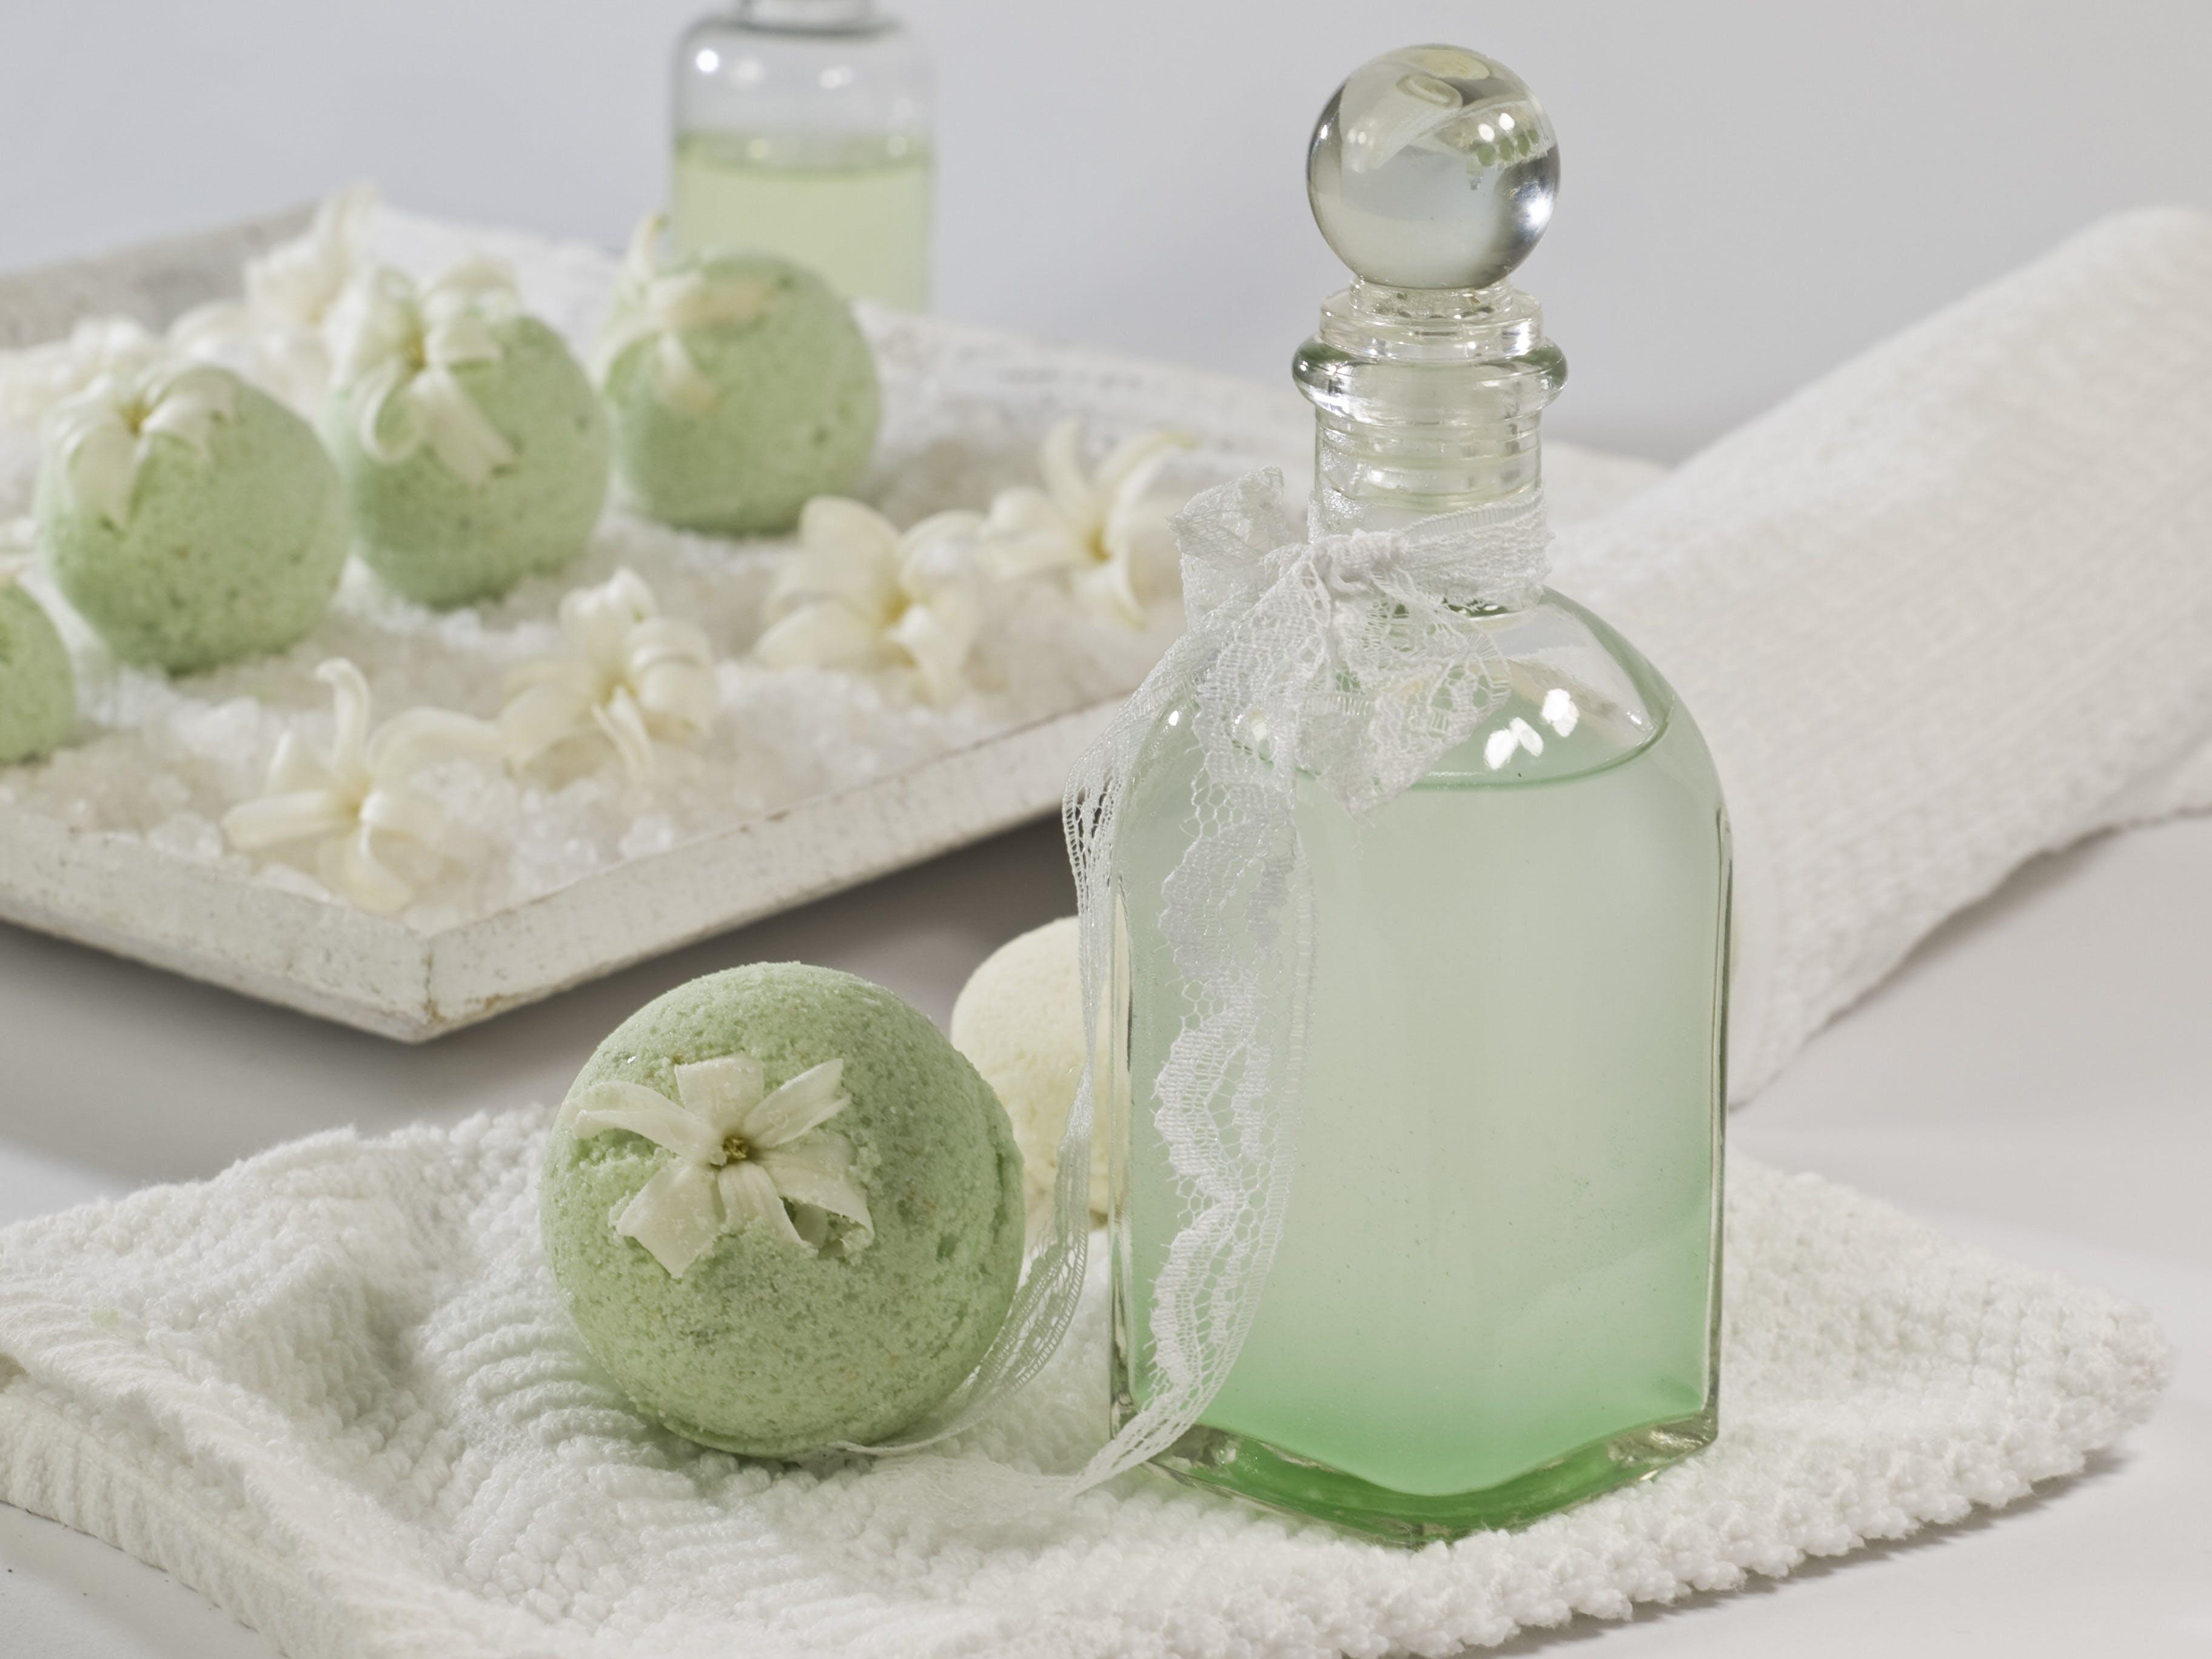 Free stock photo of bath balls, beautiful, cosmetic brush, cosmetics